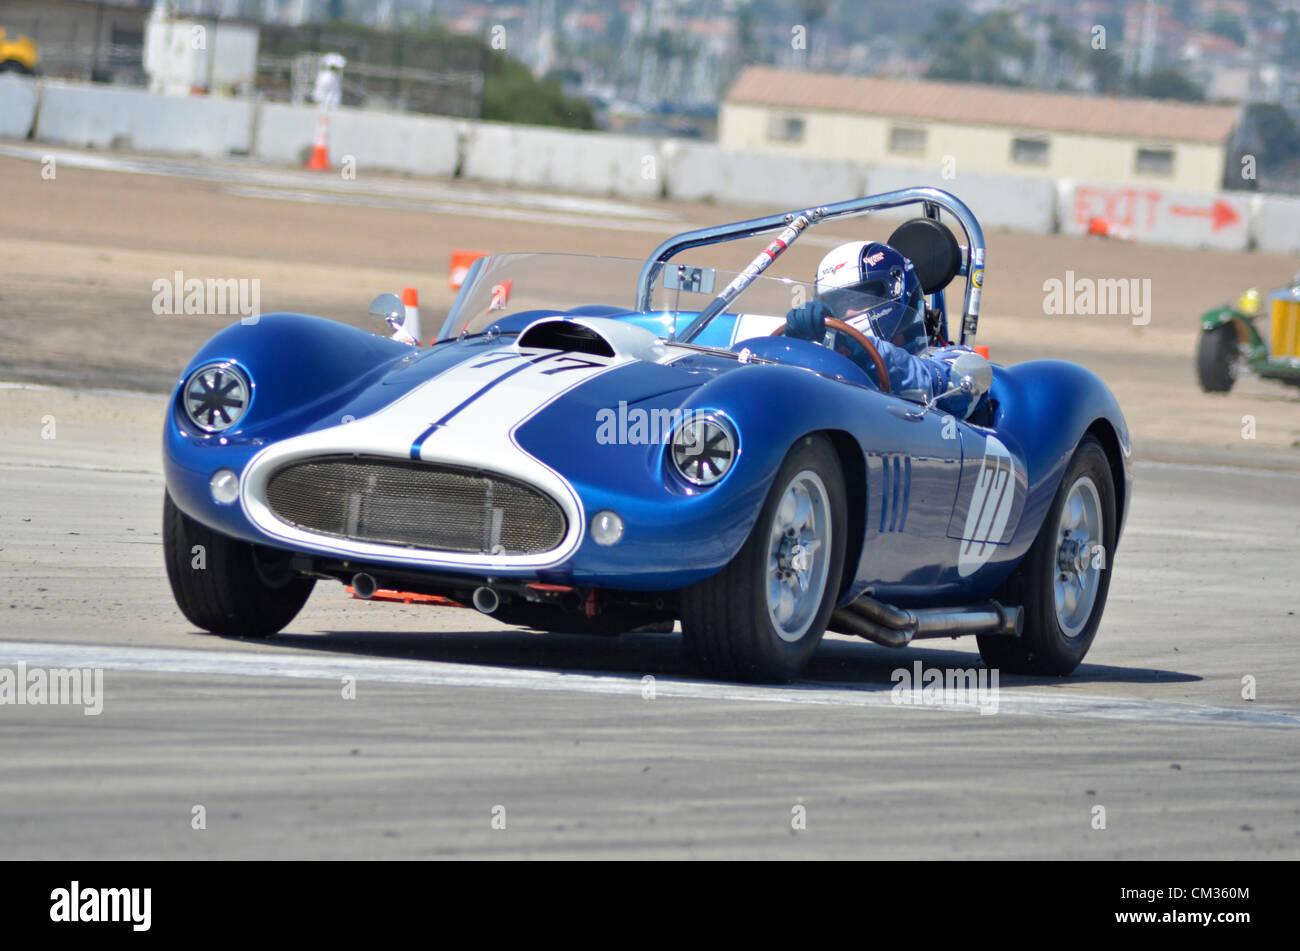 Sep. 23, 2012 - San Diego, California, U.S. - Vintage cars race ...